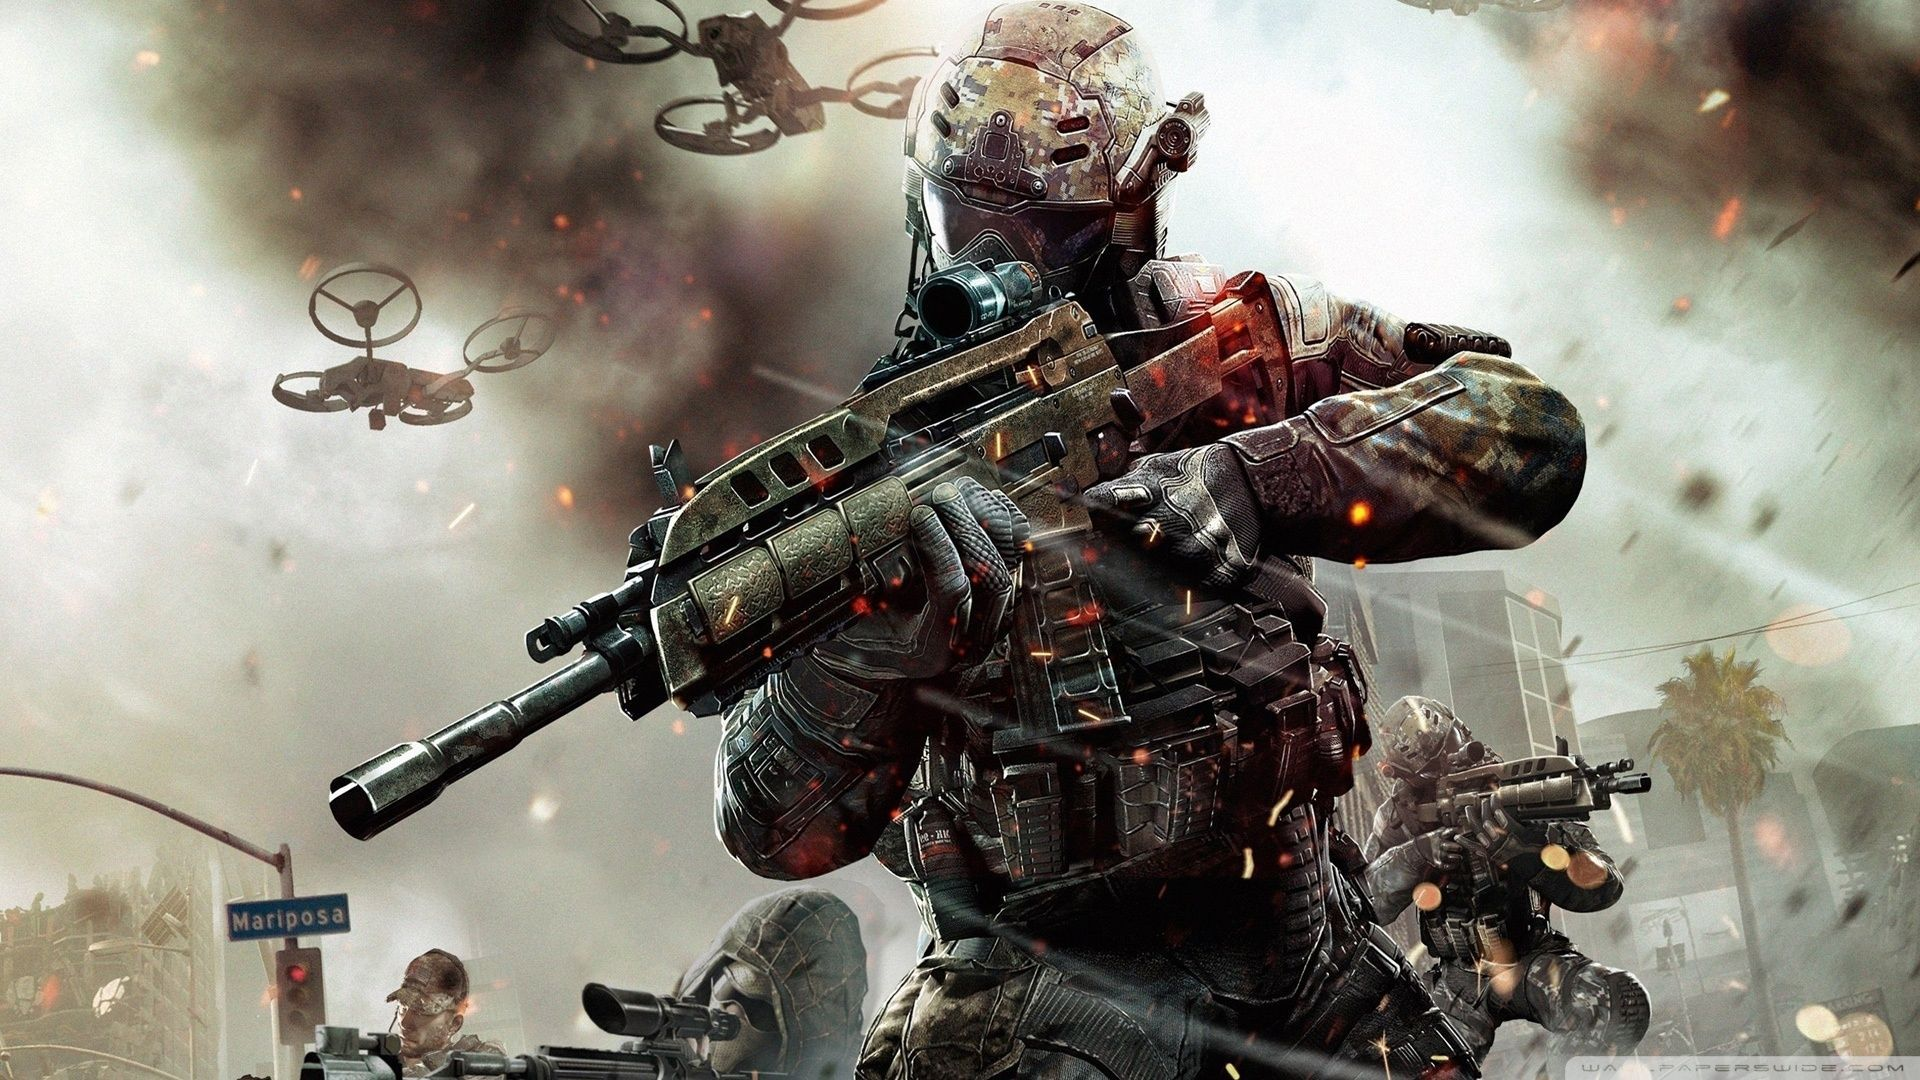 Wallpaperswide Com Call Of Duty Hd Desktop Wallpapers For 4k In 2020 Call Of Duty Black Ops 3 Call Of Duty Black Ops Iii Call Of Duty